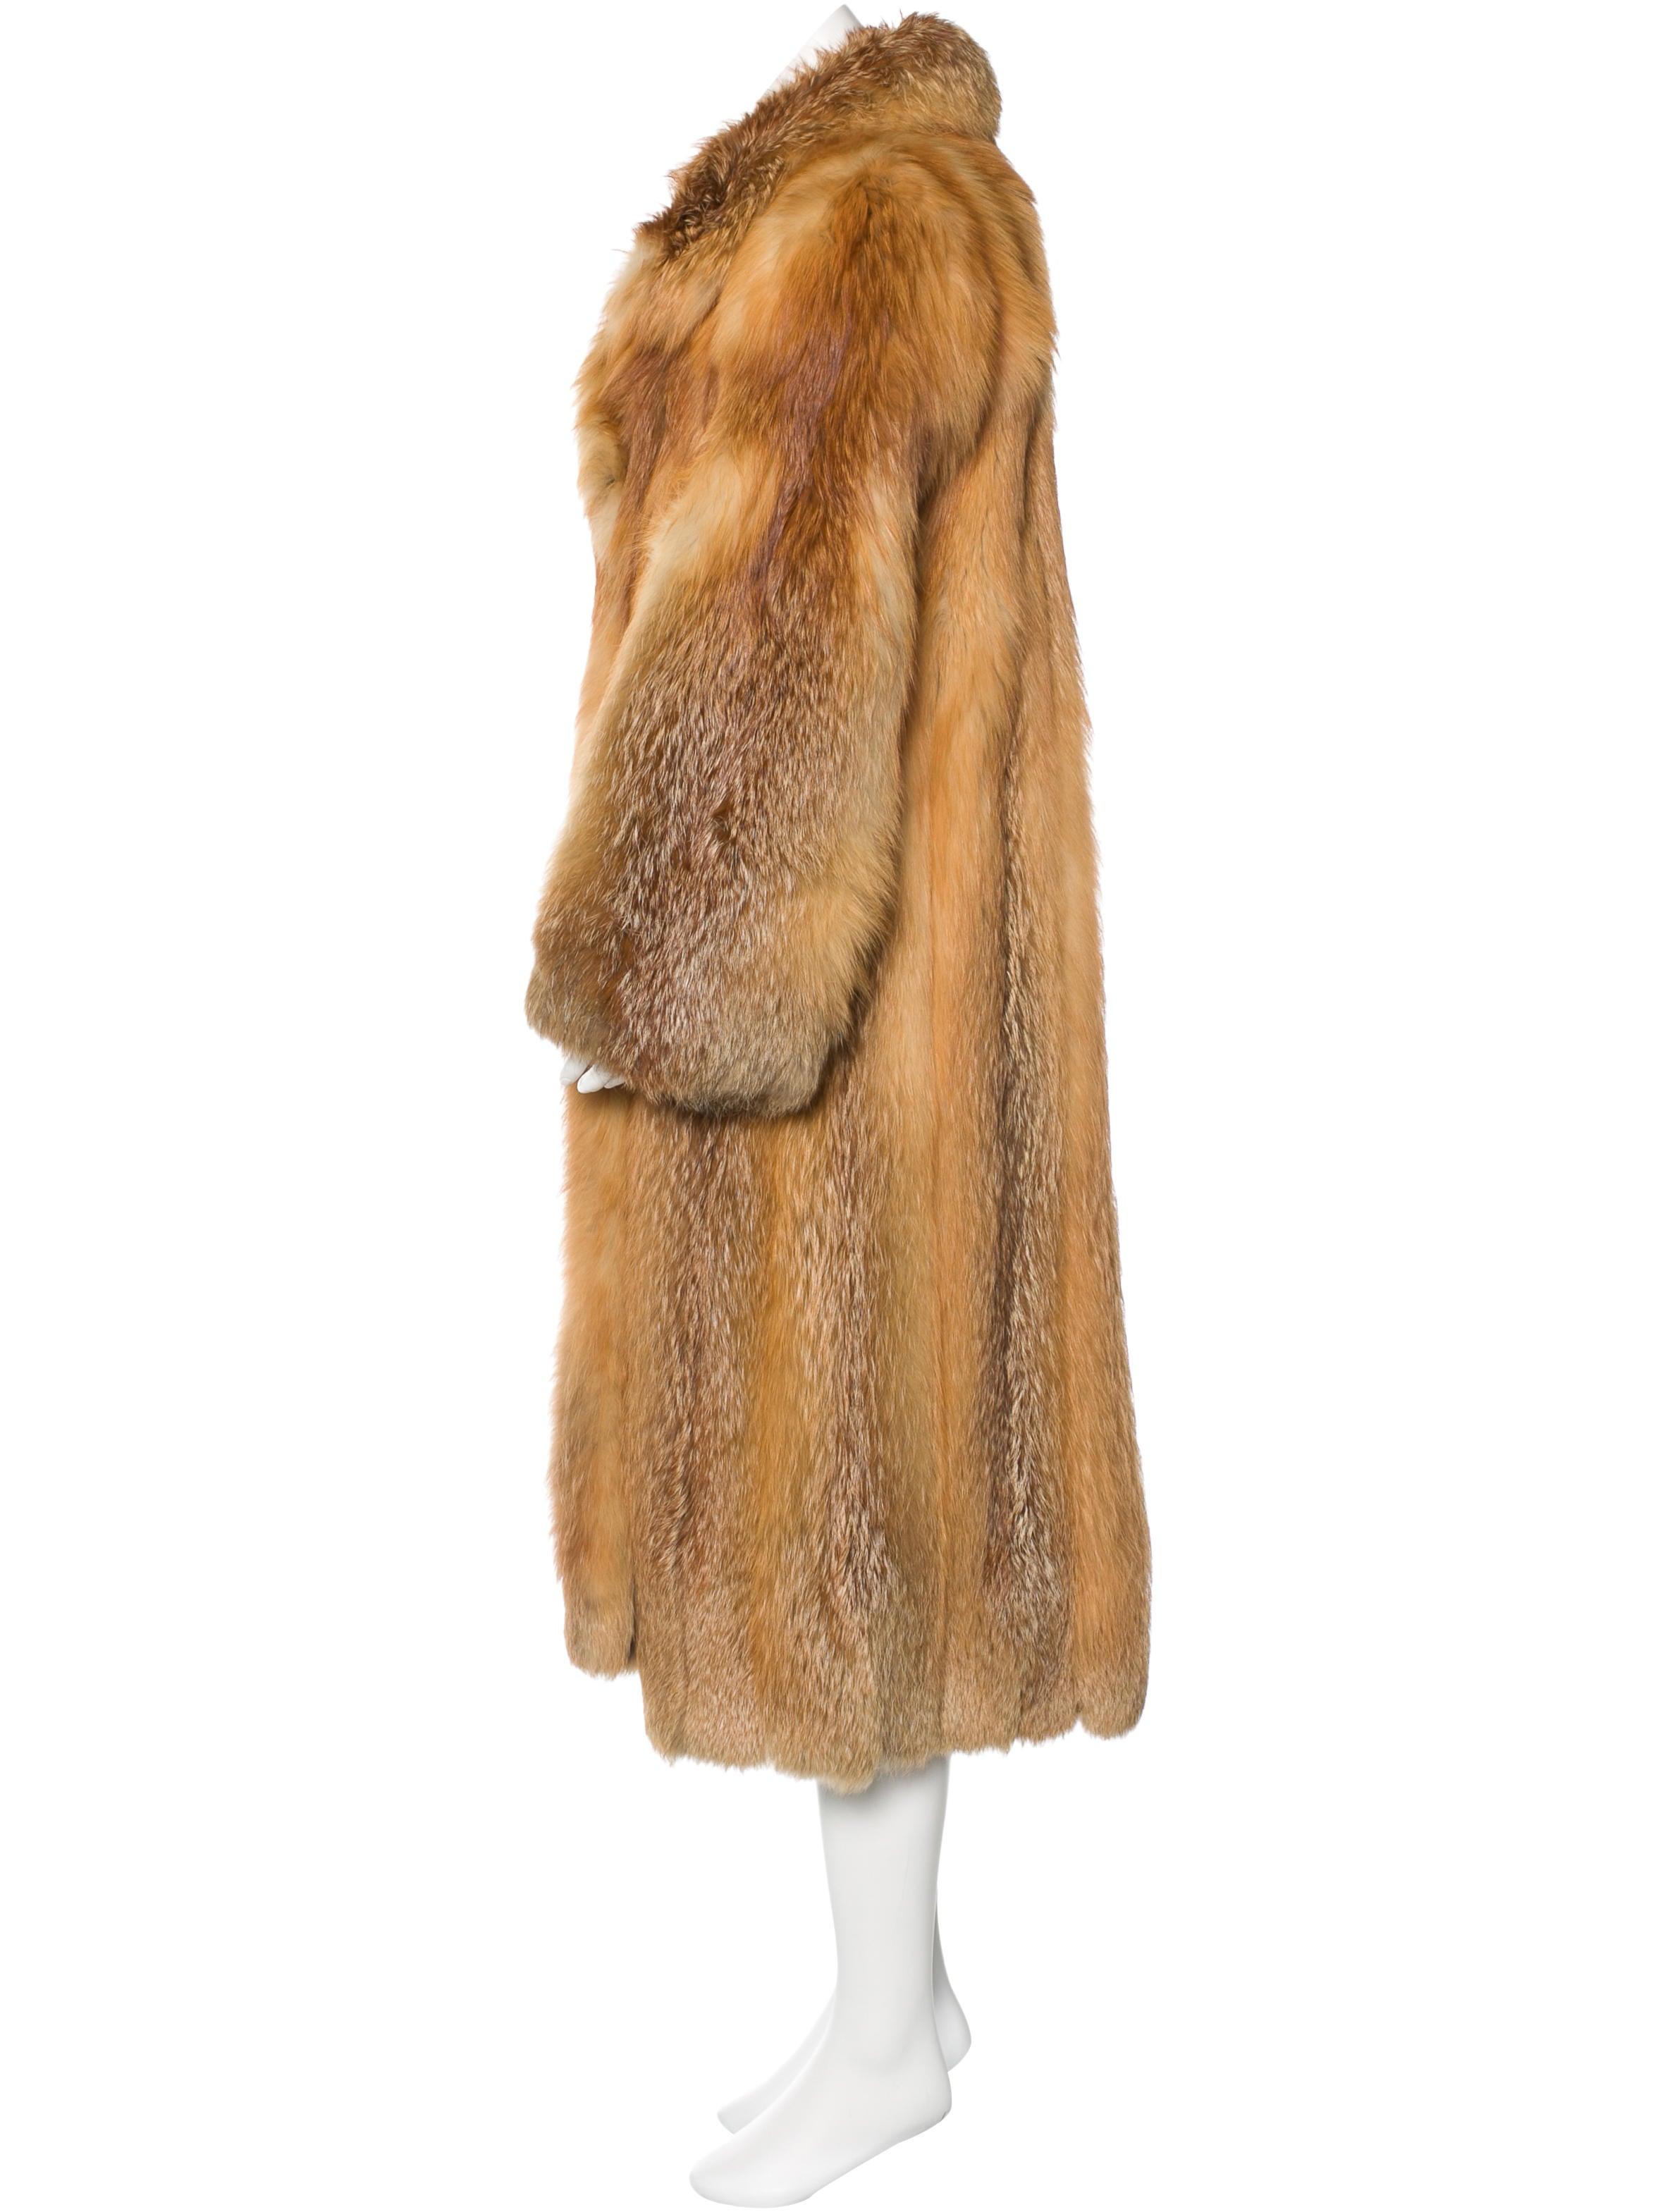 neiman marcus long fox fur coat clothing nemrc20149. Black Bedroom Furniture Sets. Home Design Ideas